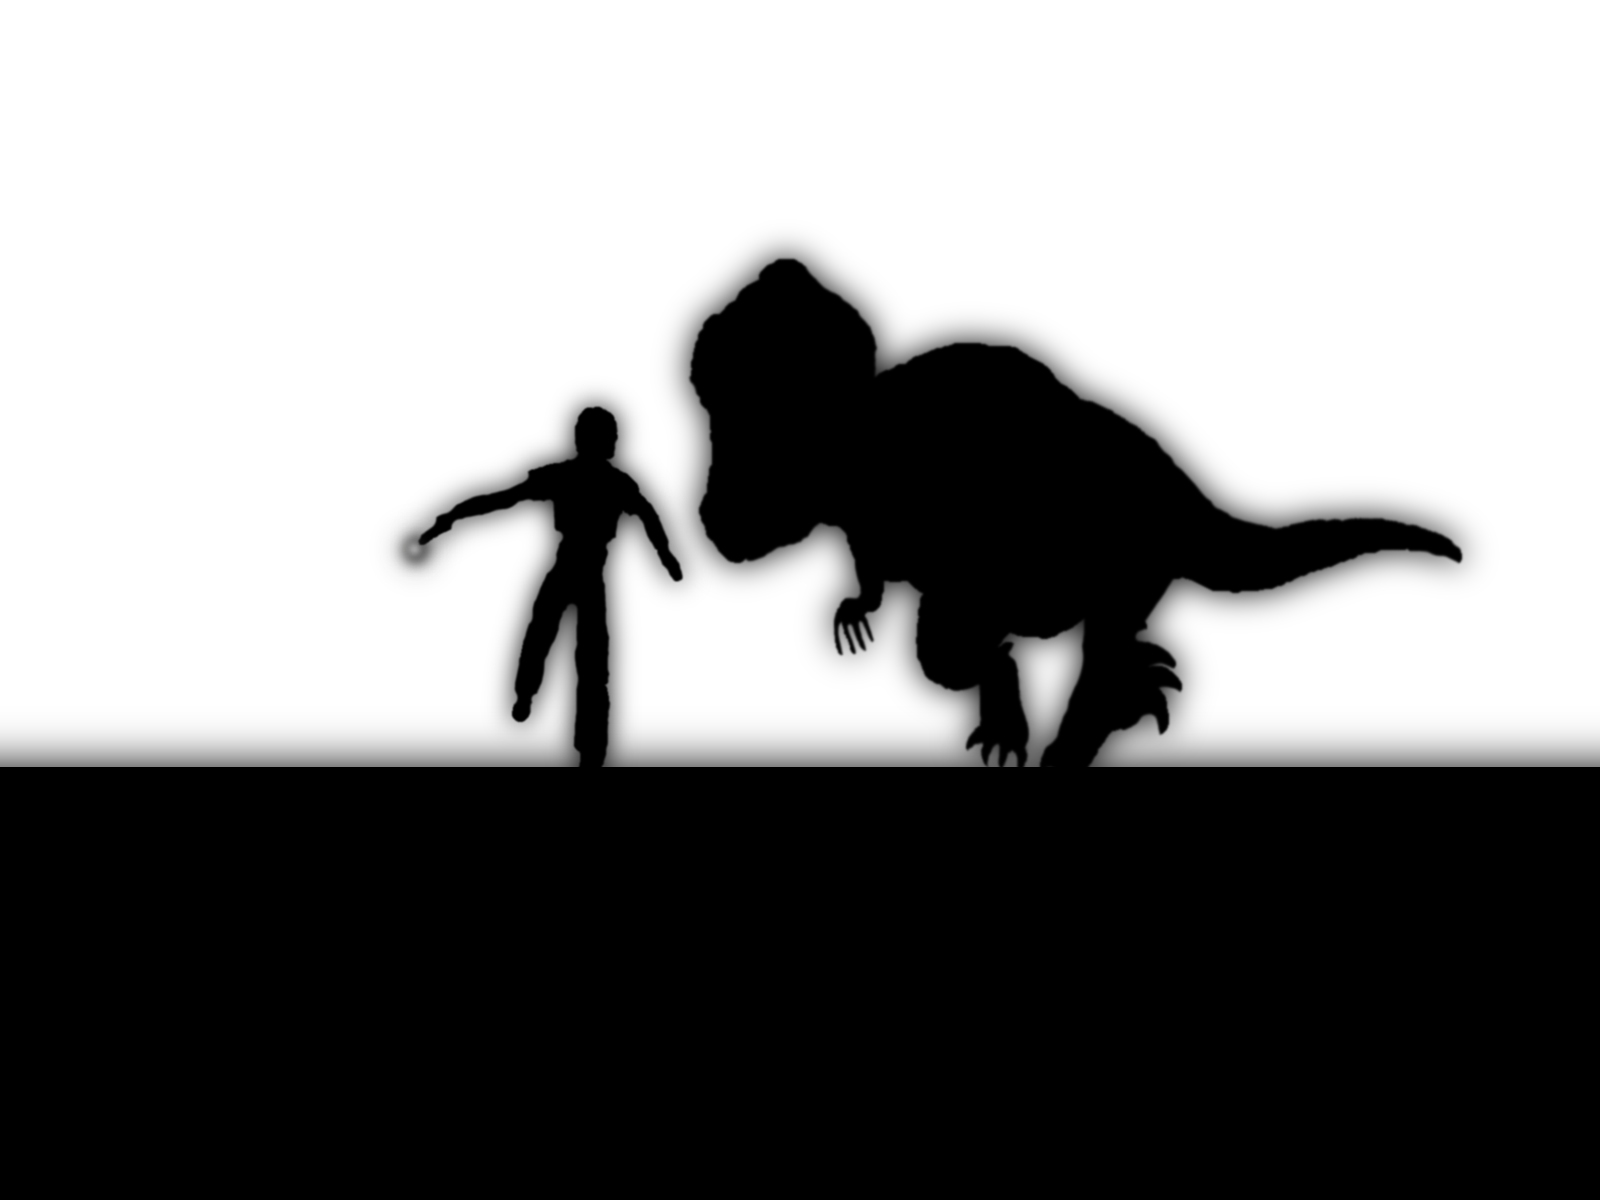 1600x1200 Wallpaper Jurassic Park, T Rex, Silhouette, Monochrome 1600x1200